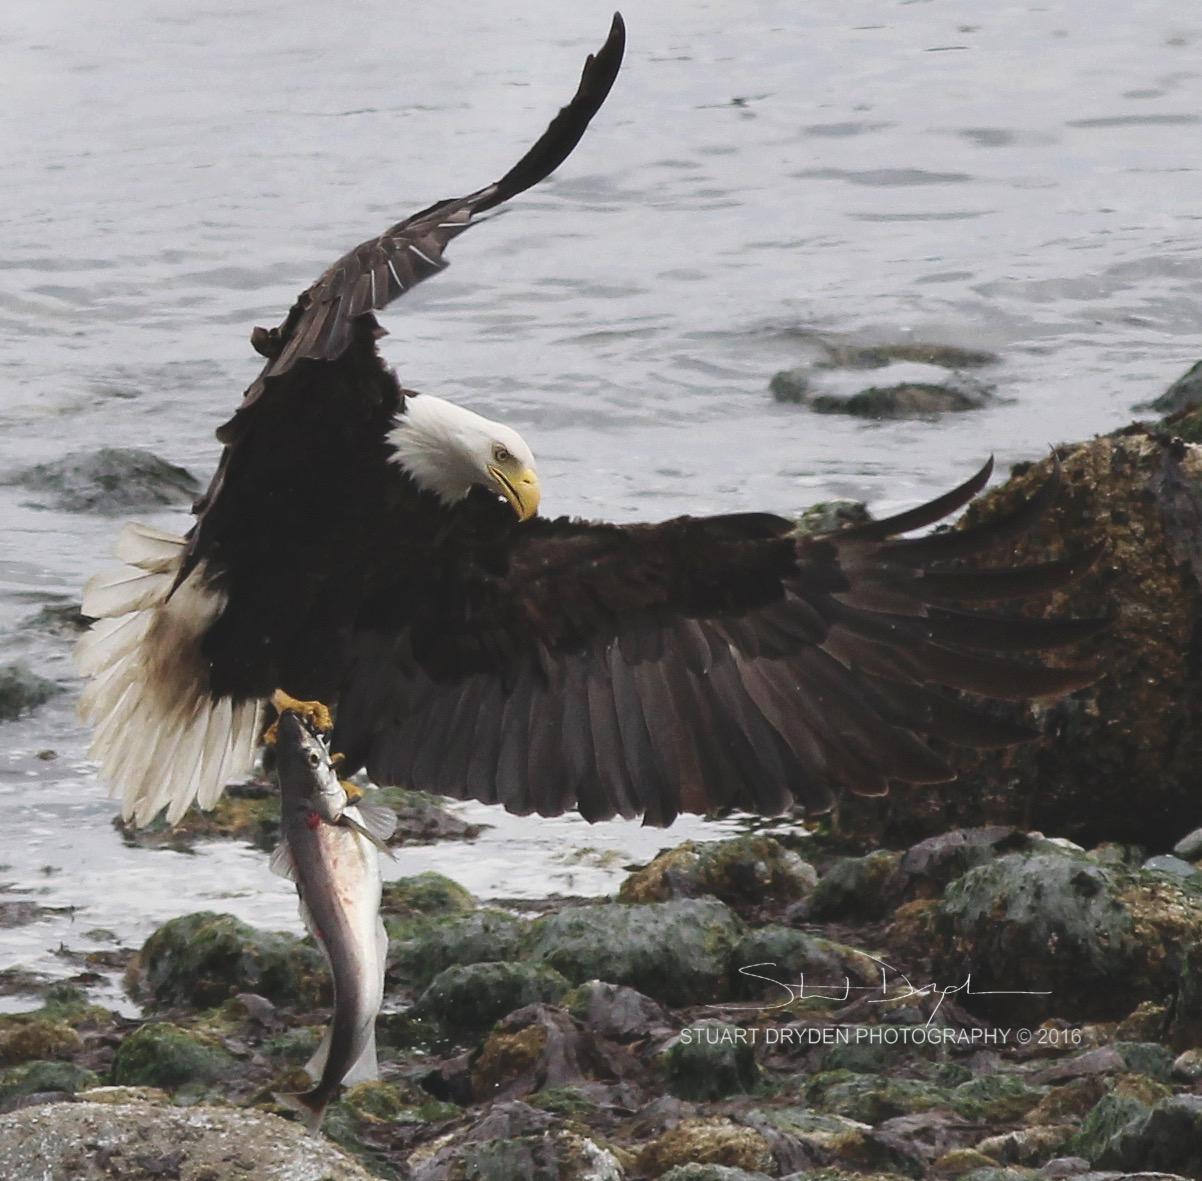 eagle-fish-21-05-16_052-tight2.jpg